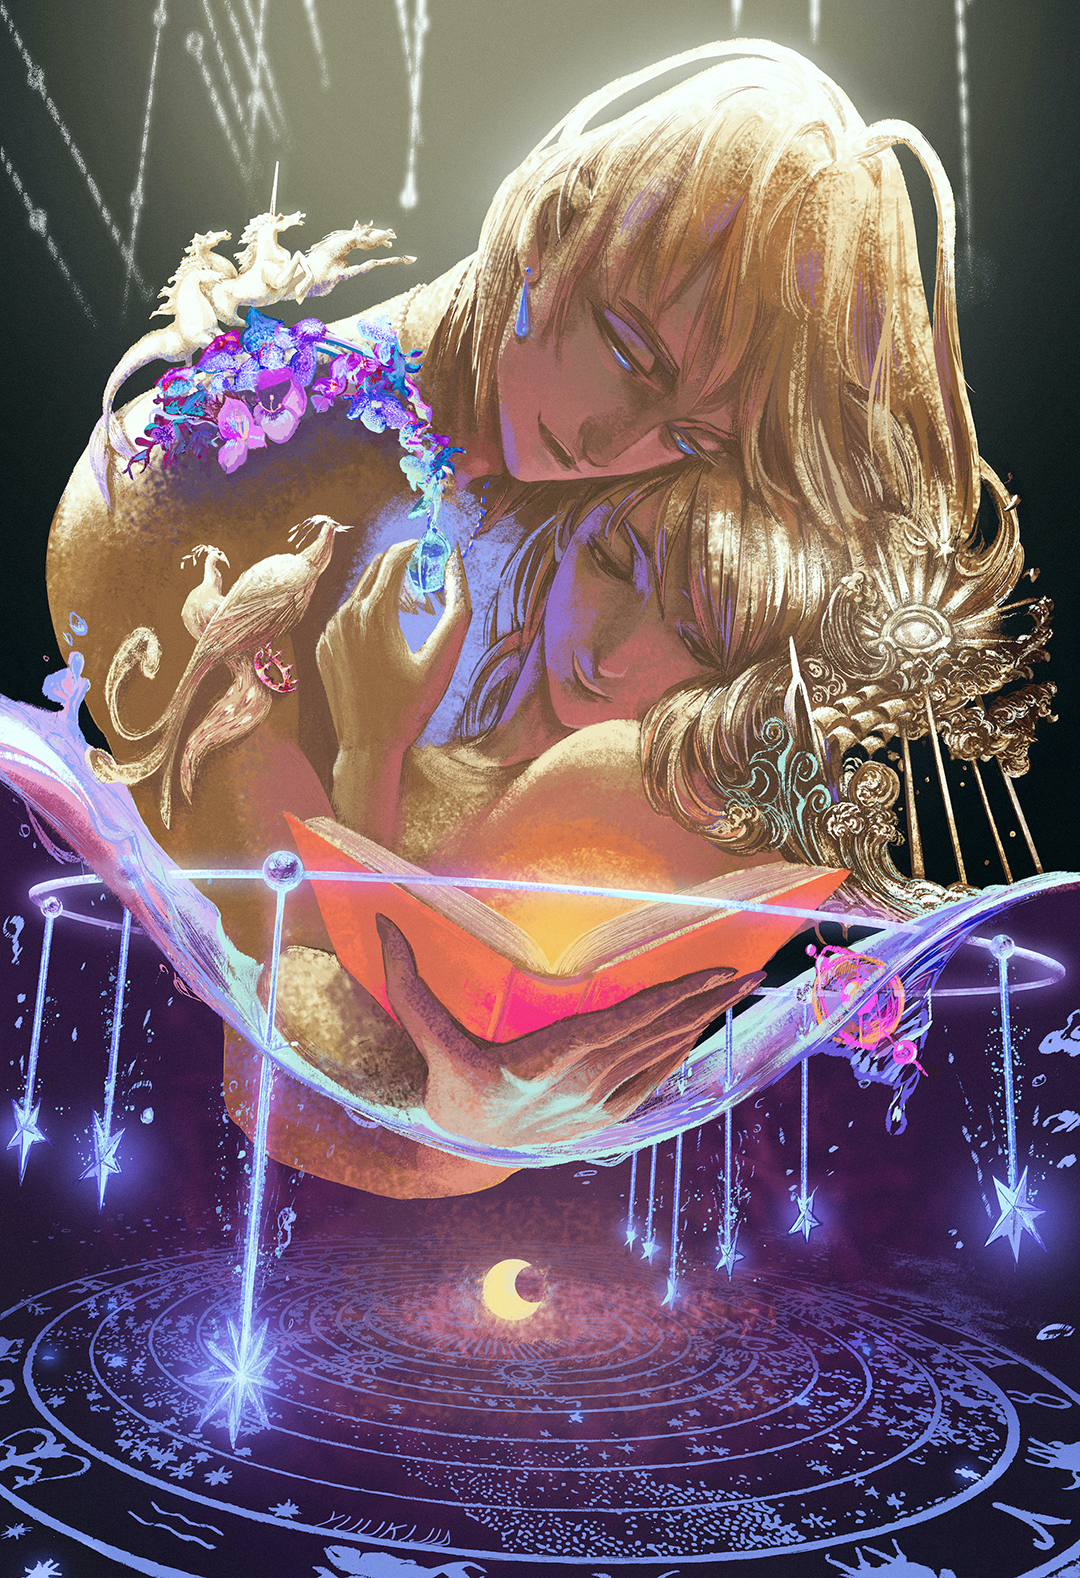 GirlsclubAsia-Artist-Yuuki Jia Artworks 03